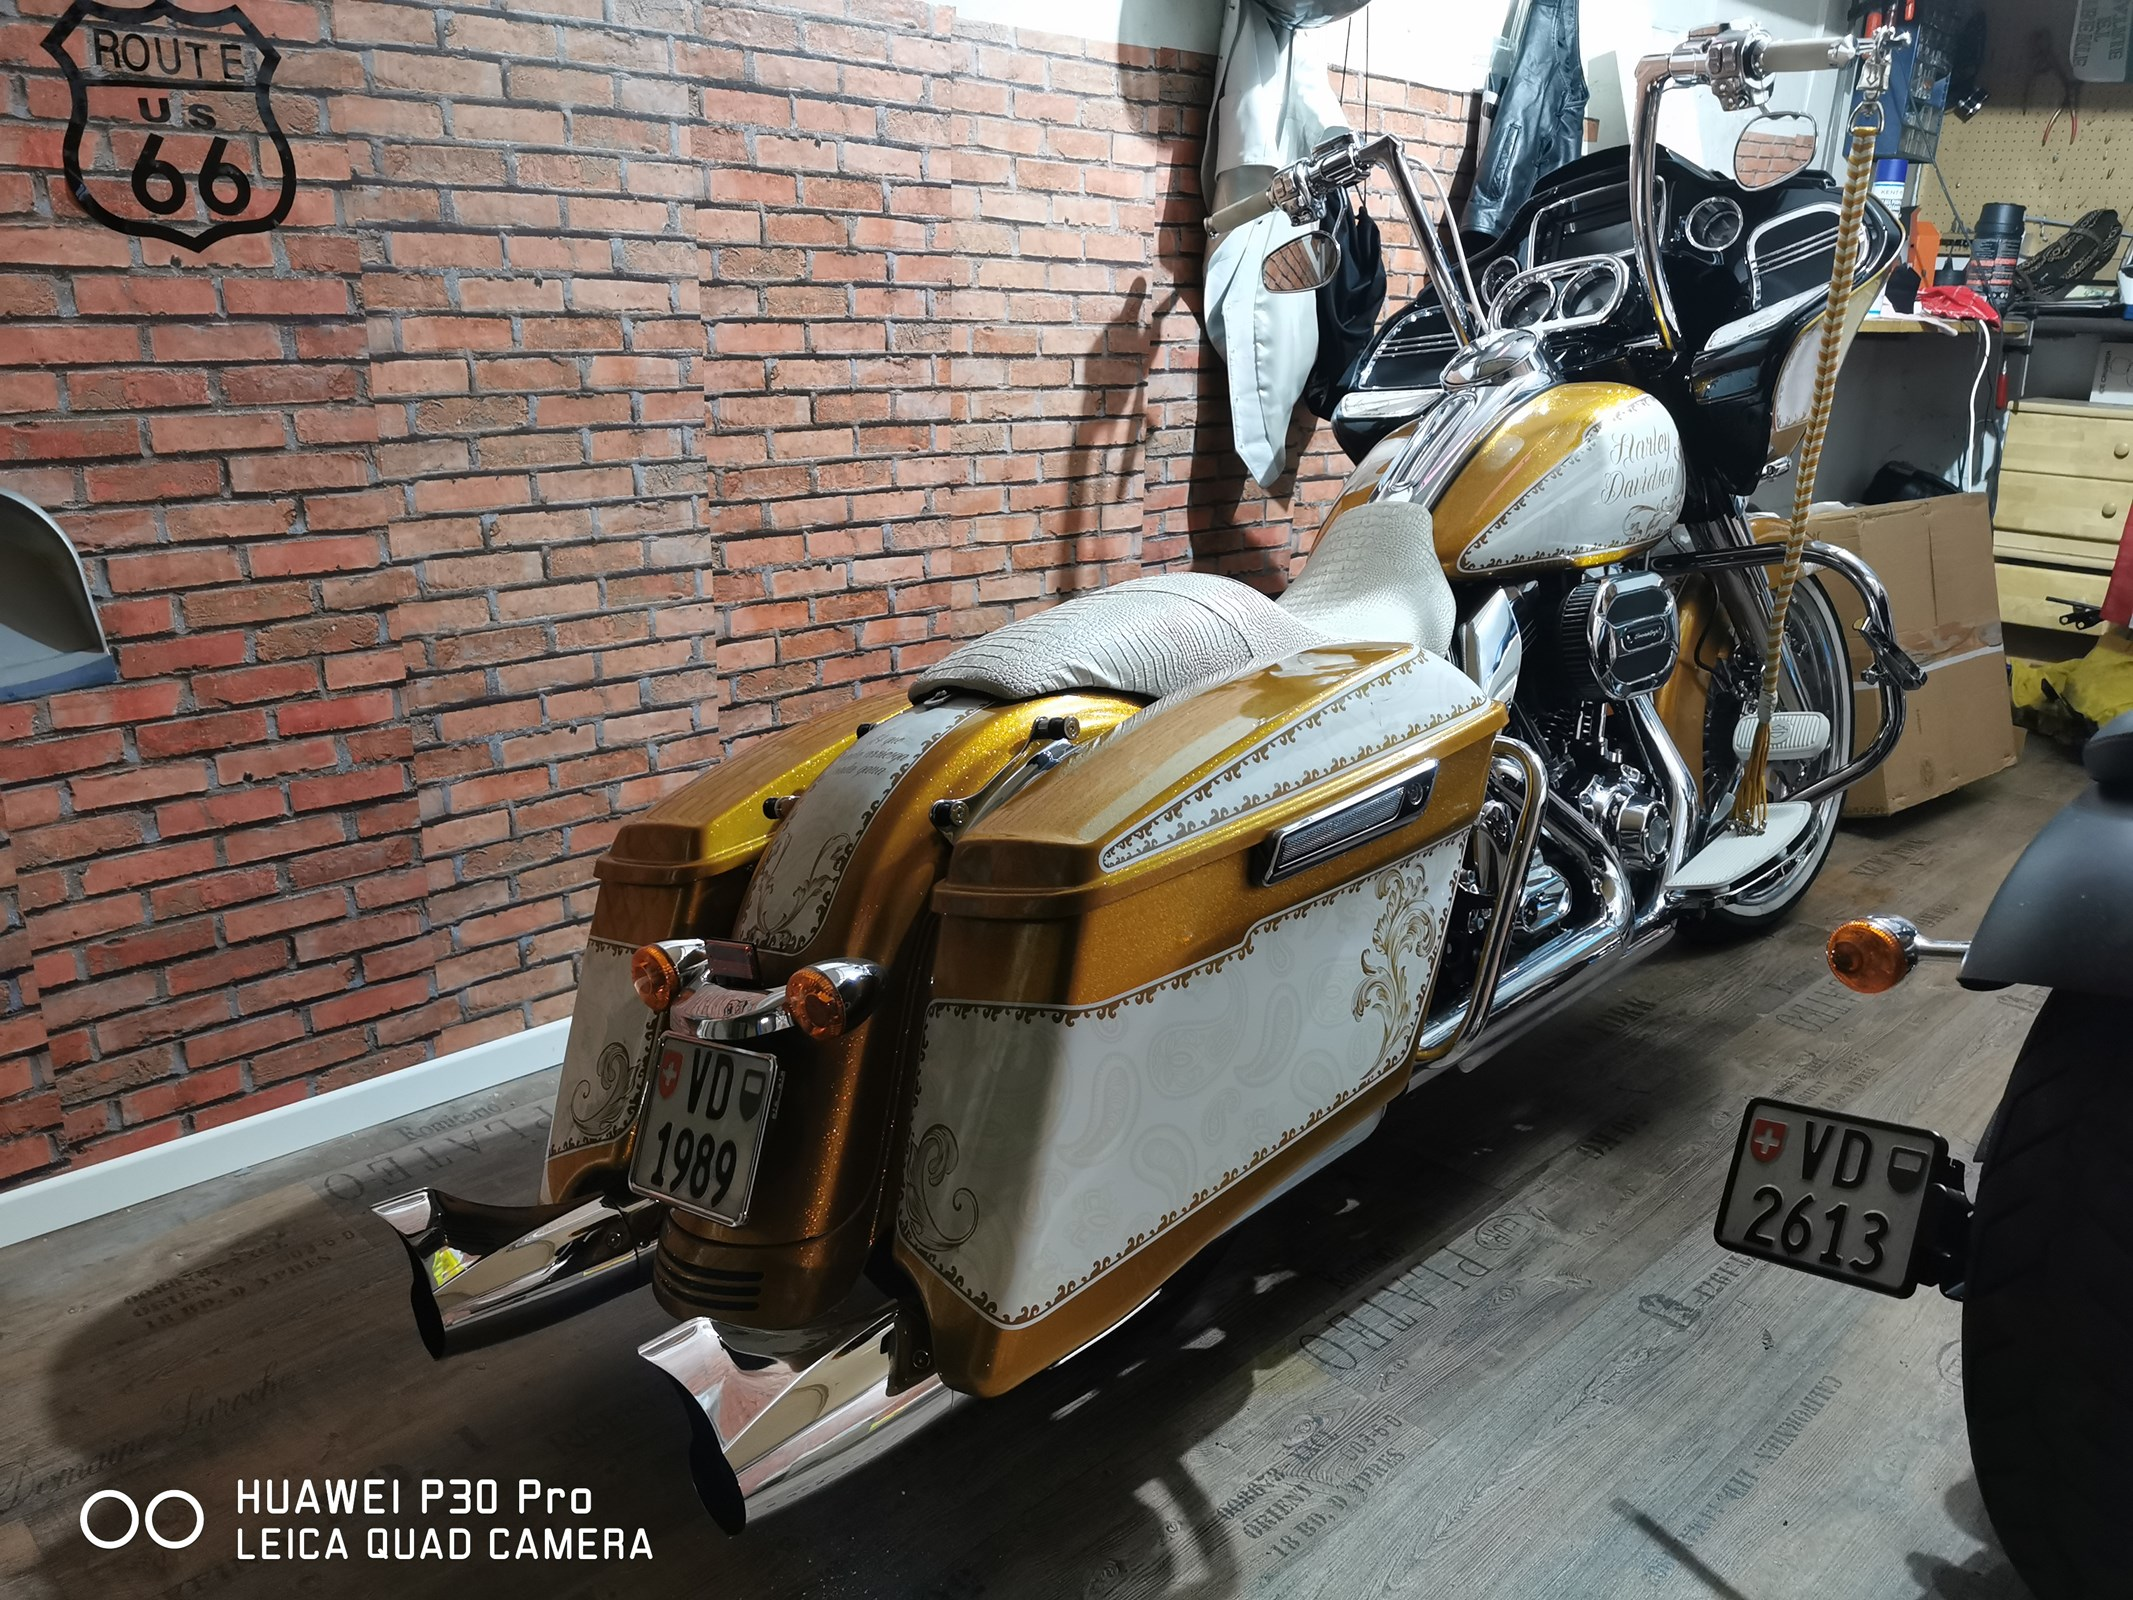 Harley-Davidson FLTRXS 1690 Road Glide Special ABS